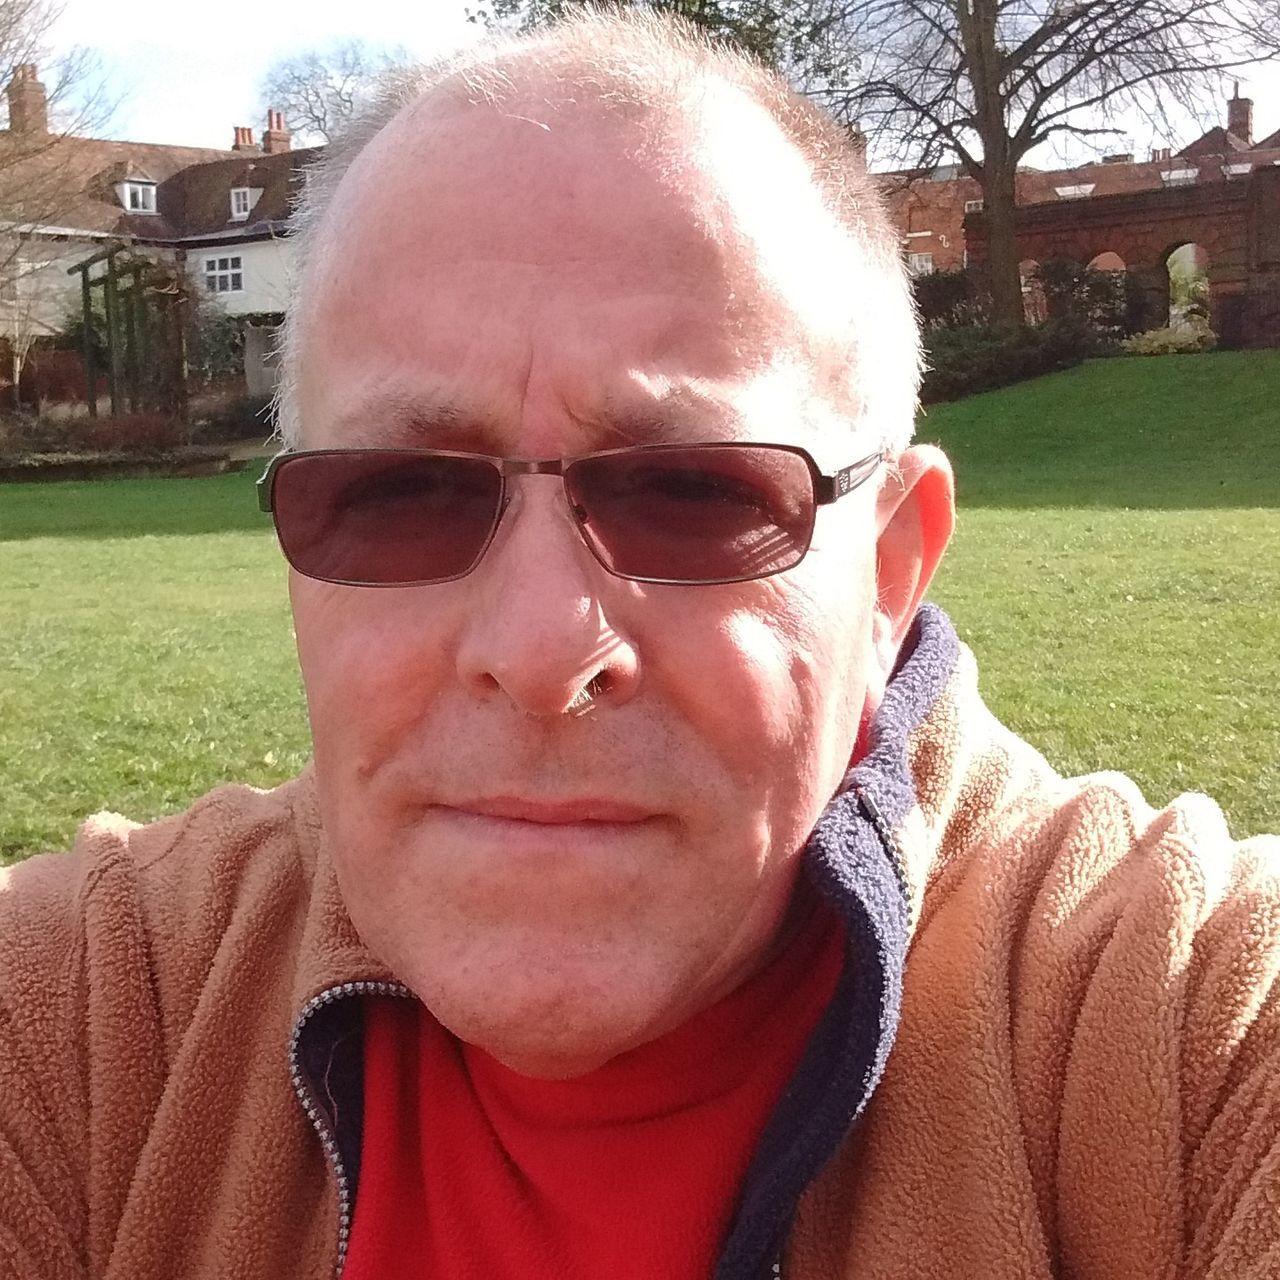 Close-Up Of Man Wearing Sunglass On Grassy Field